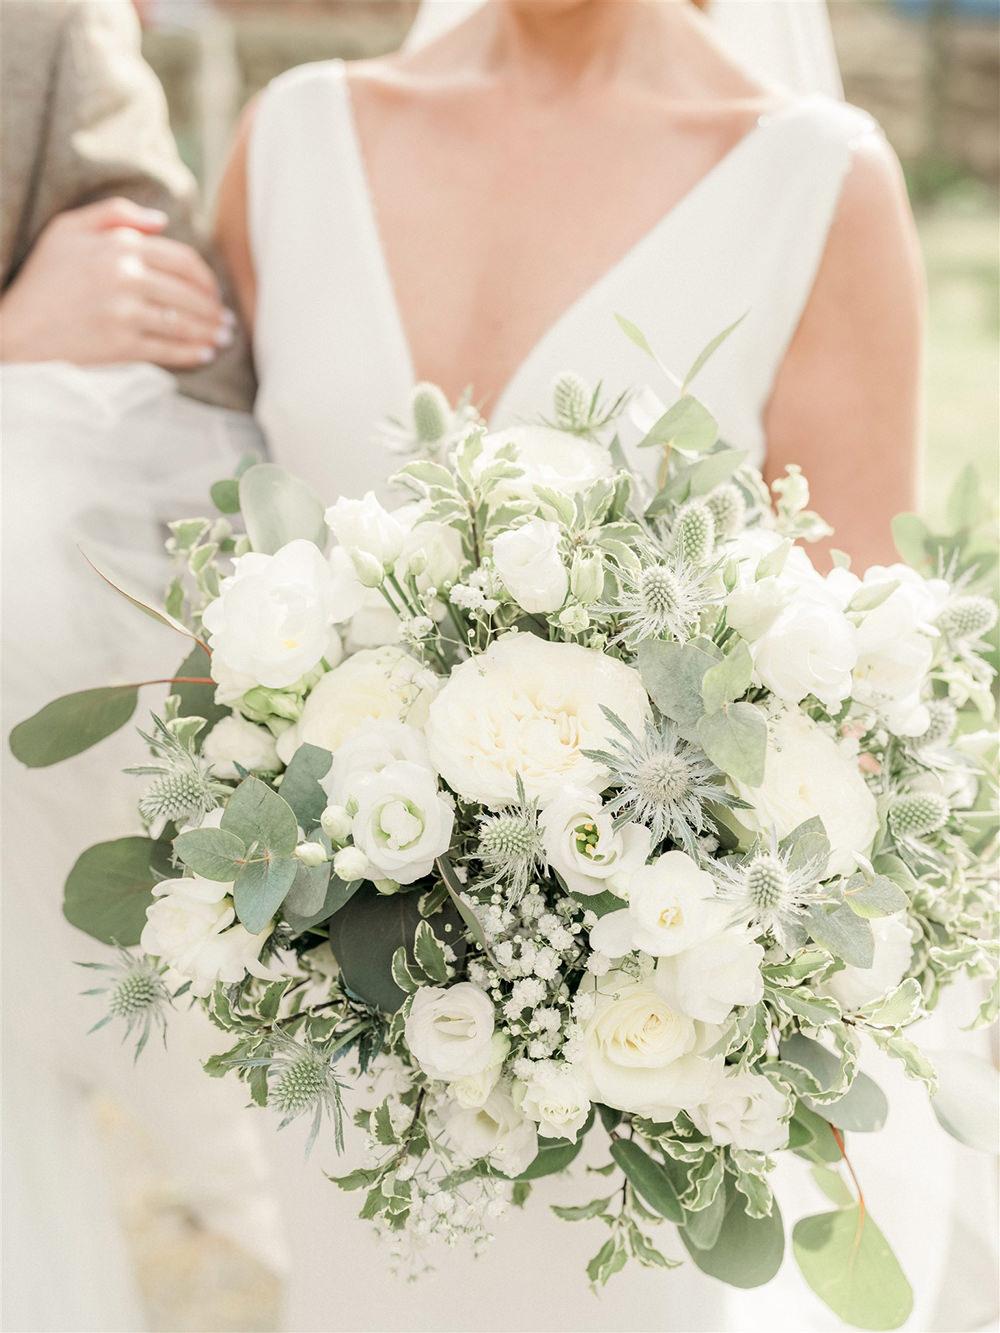 Bouquet Flowers Bride Bridal Thistle Rose Eucalyptus Lockdown Wedding Carn Patrick Photography